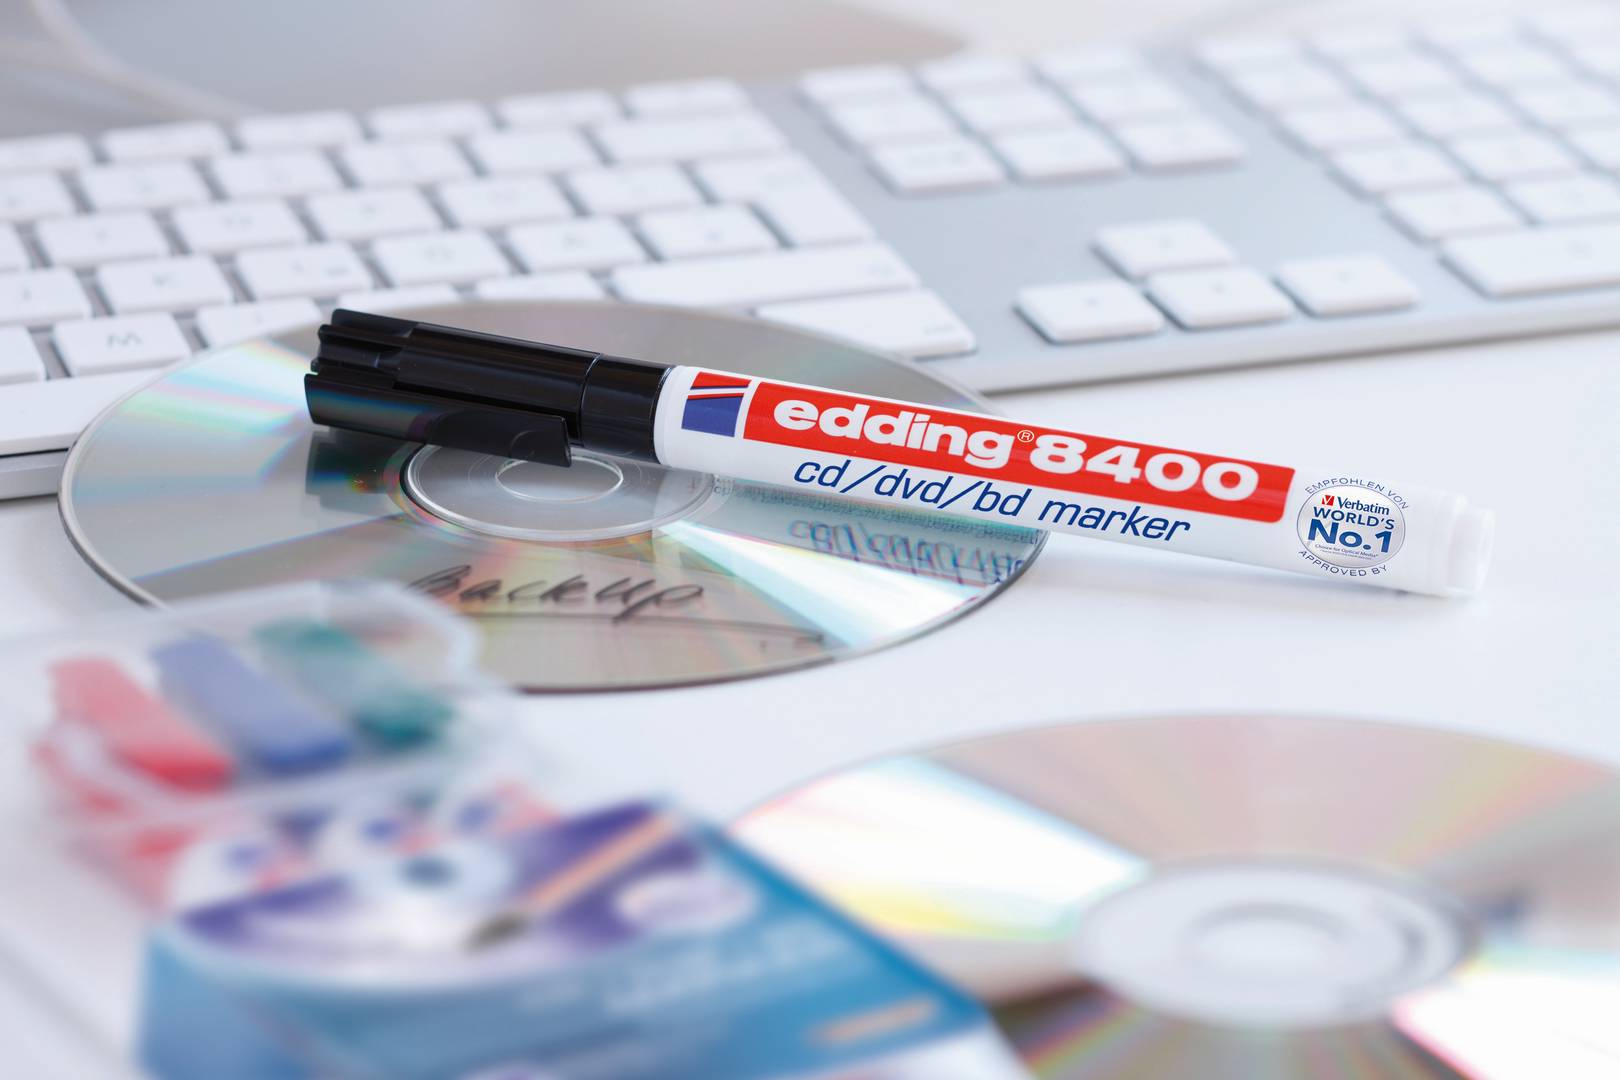 edding 8400 popisovač na CD/DVD/BD, kulatý hrot 0.5 -1 mm, sada 4 ks